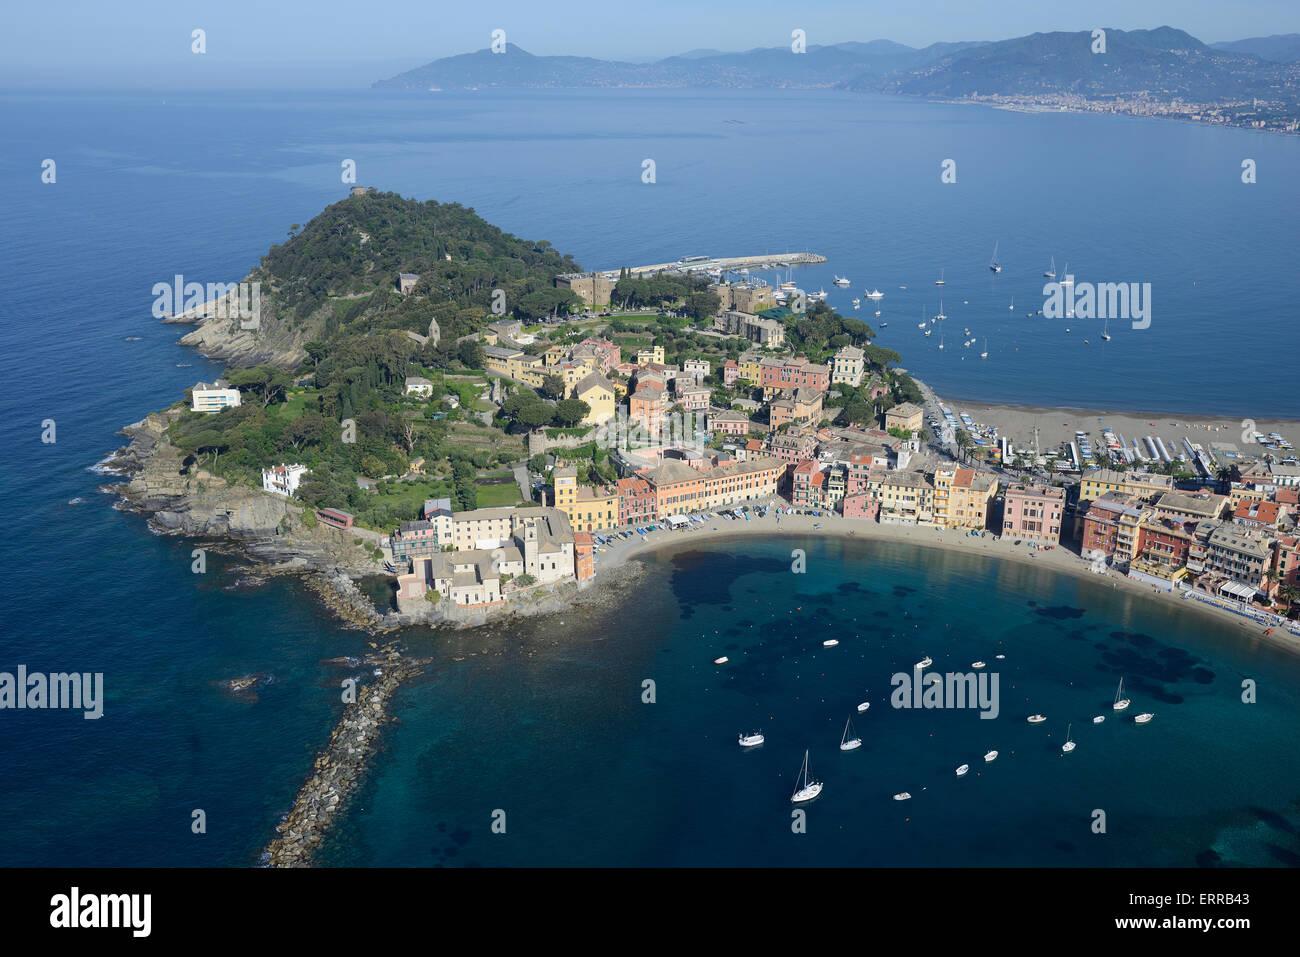 SEASIDE RESORT and FISHING VILLAGE (aerial view). Sestri Levante, Liguria, Italy. - Stock Image